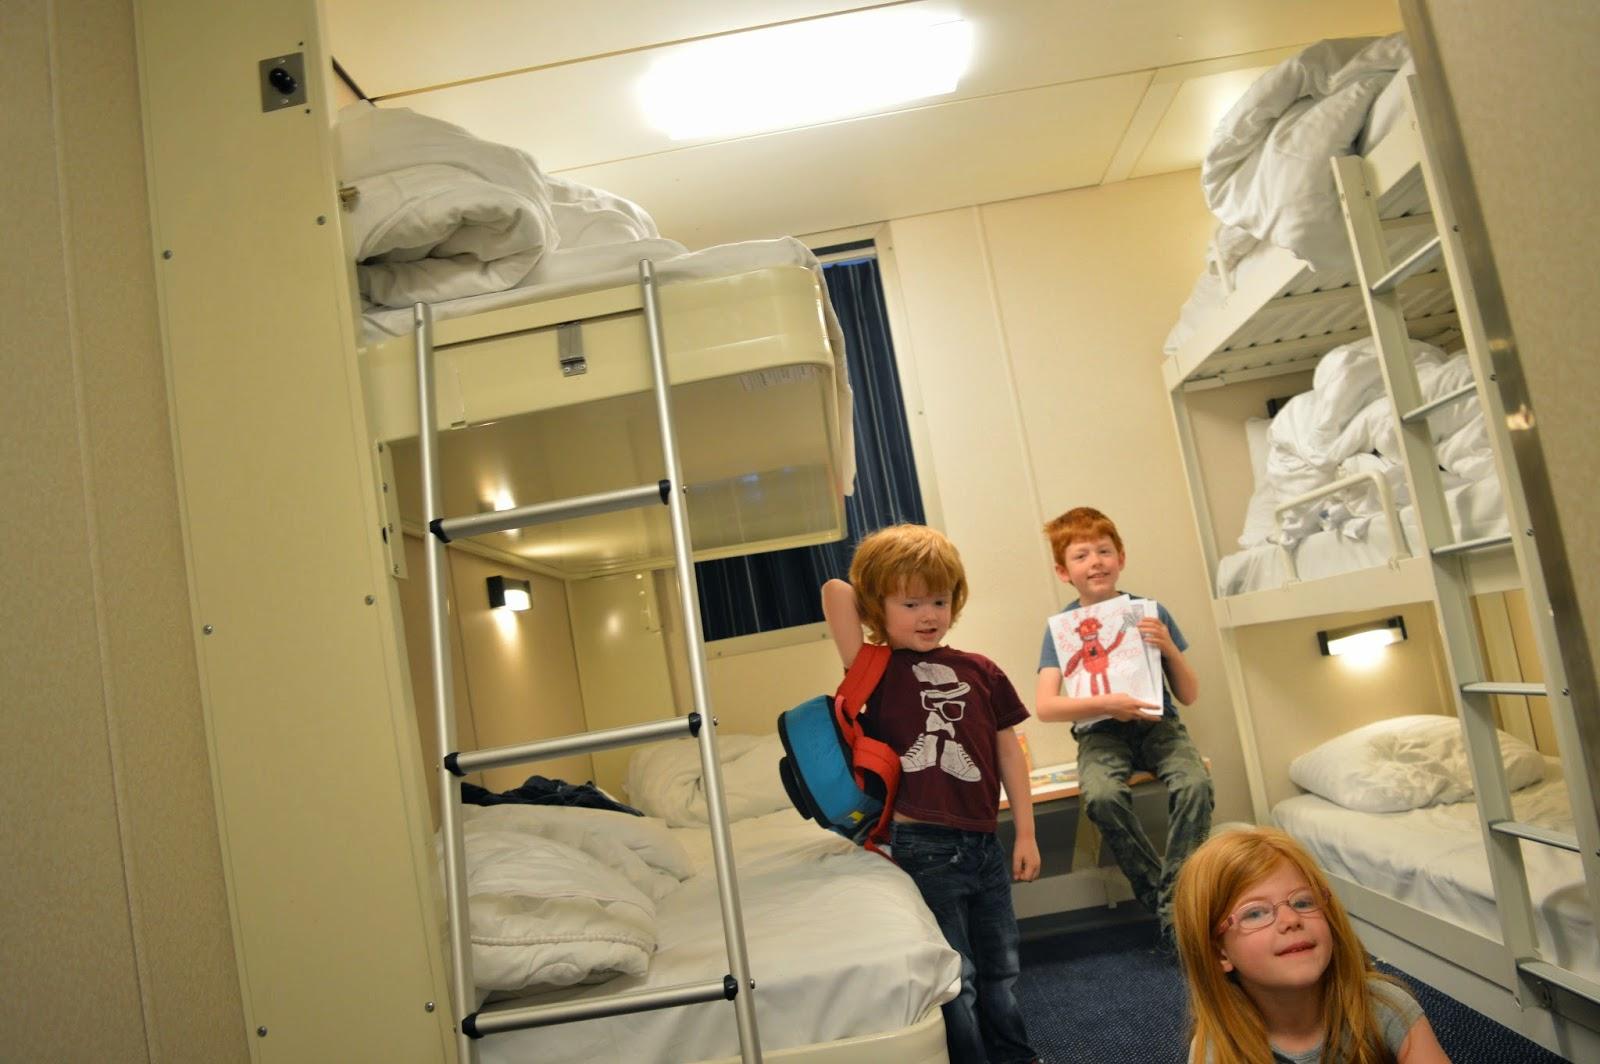 Inside a DFDS Seaways 5 berth family cabin